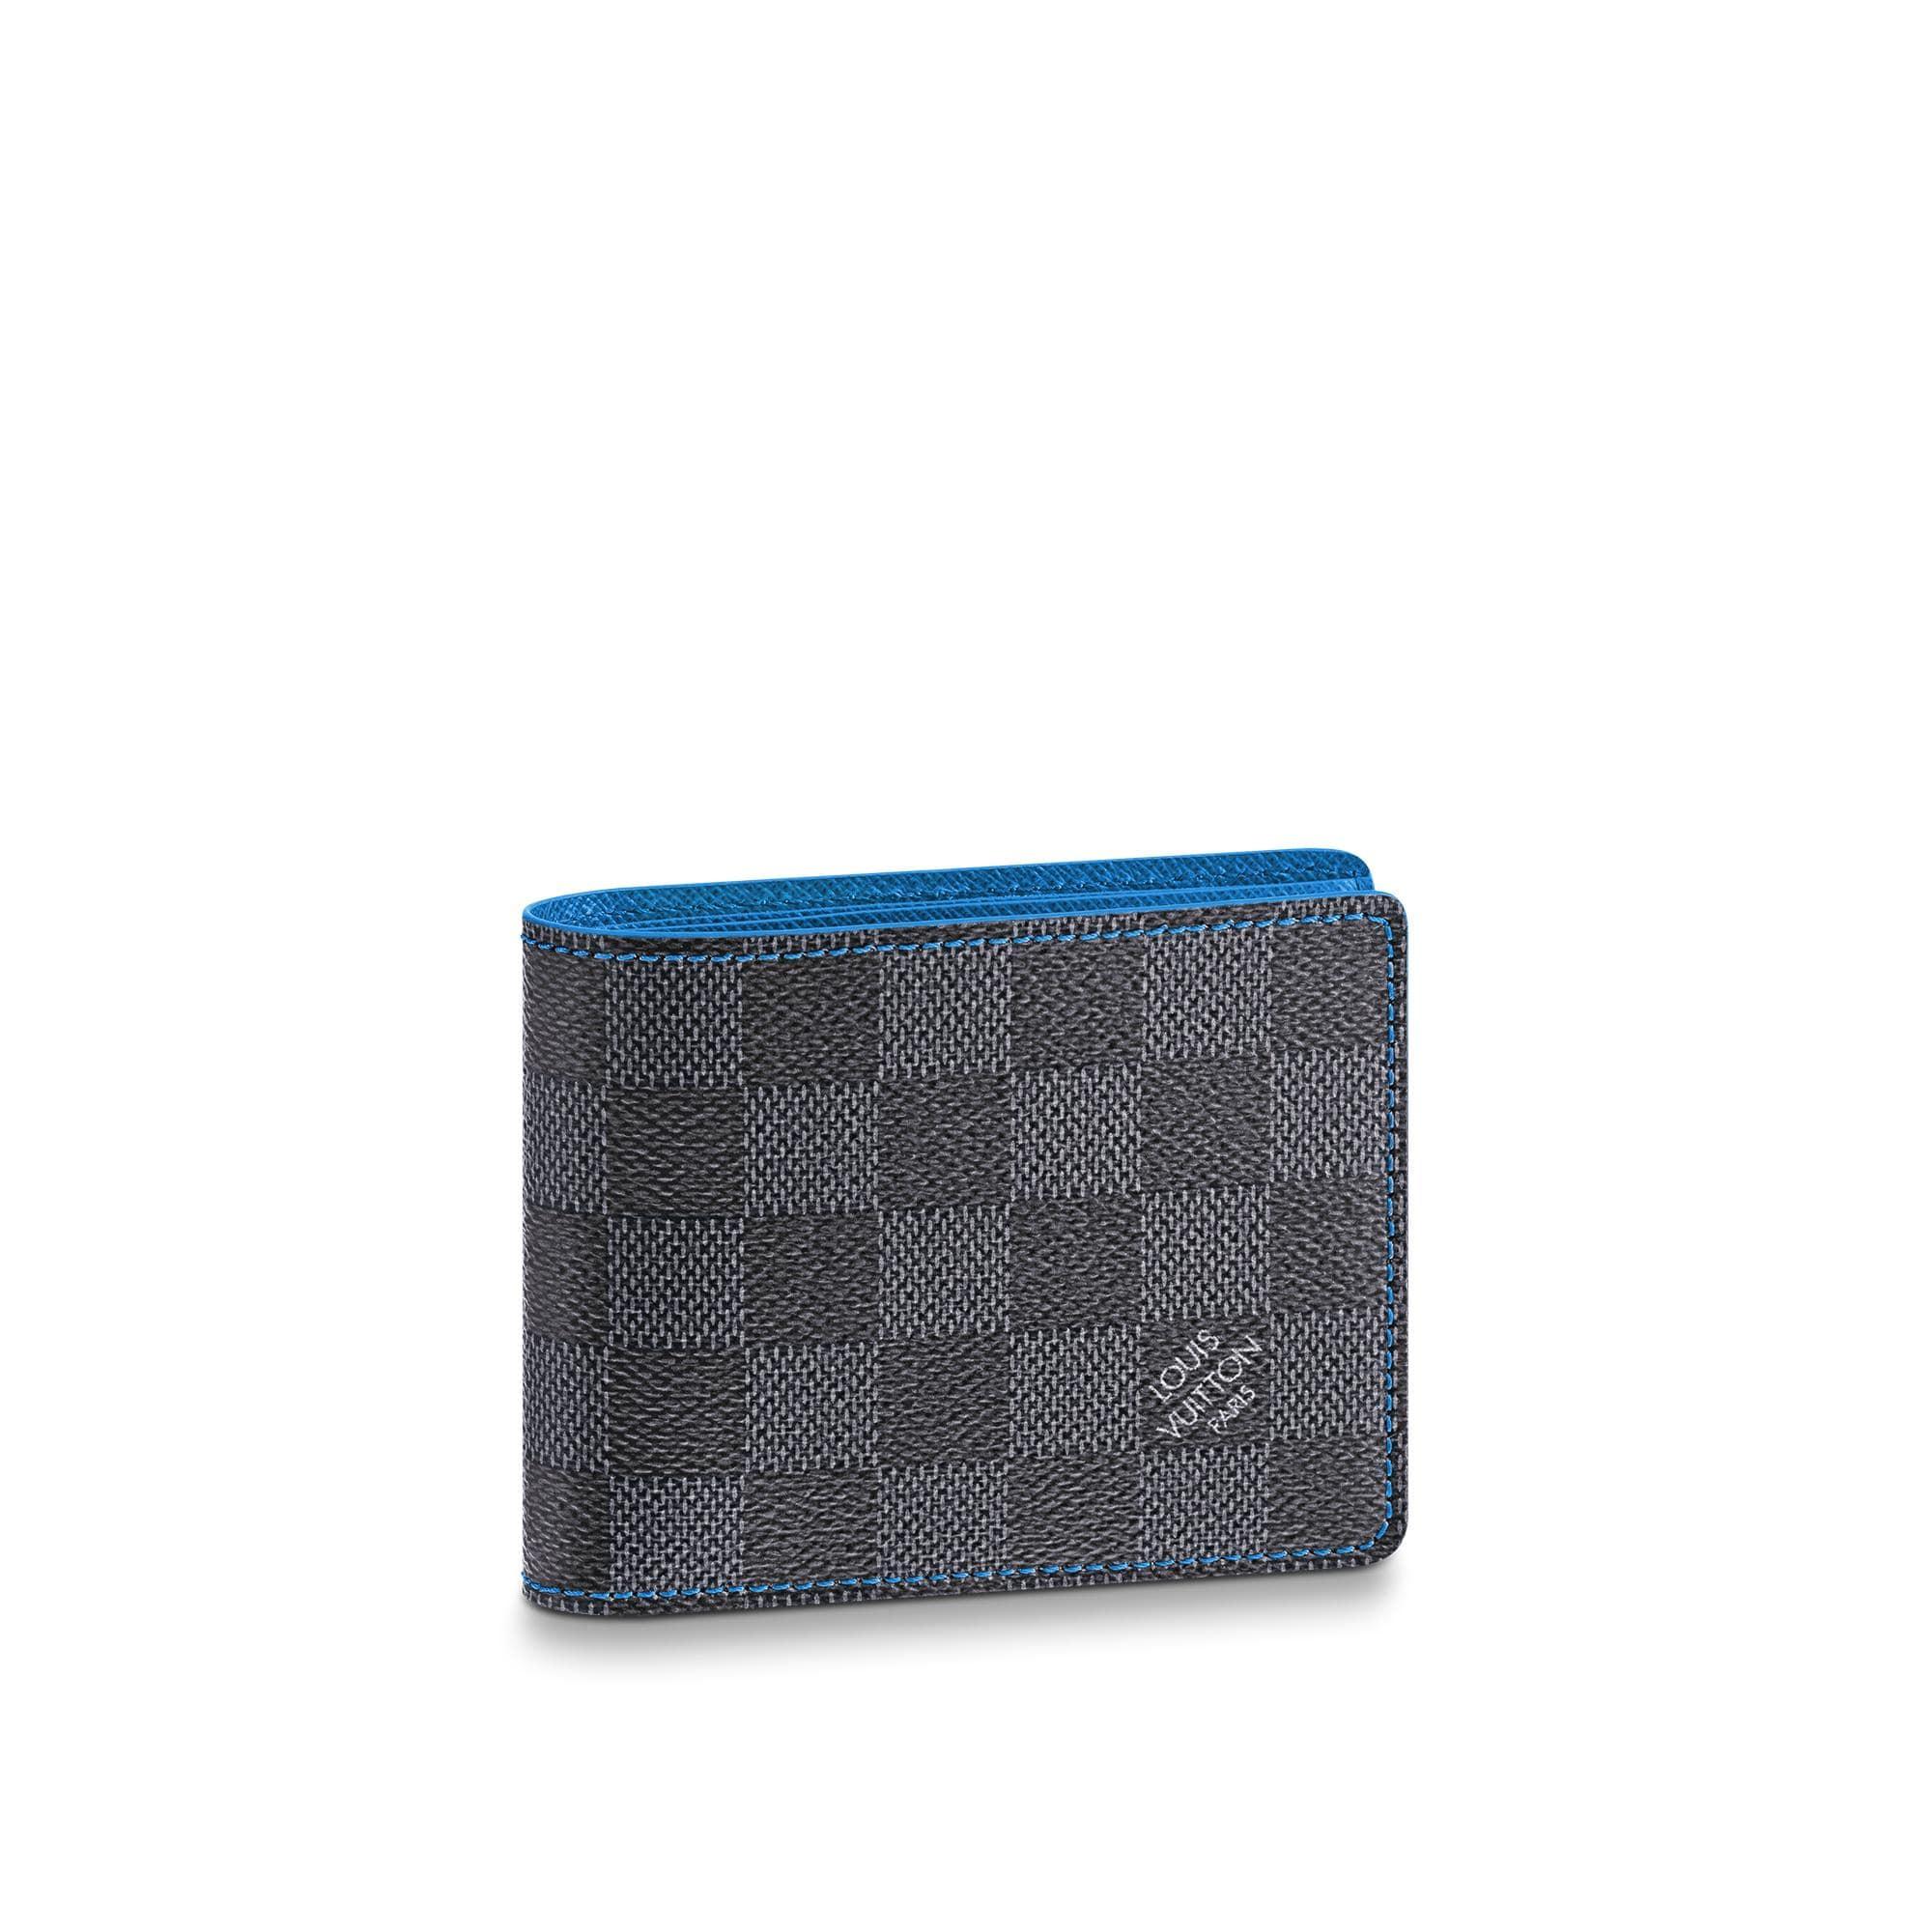 Louis Vuitton Multiple Wallet Damier Graphite Black/Grey/Neon Blue In Black/Grey/Blue